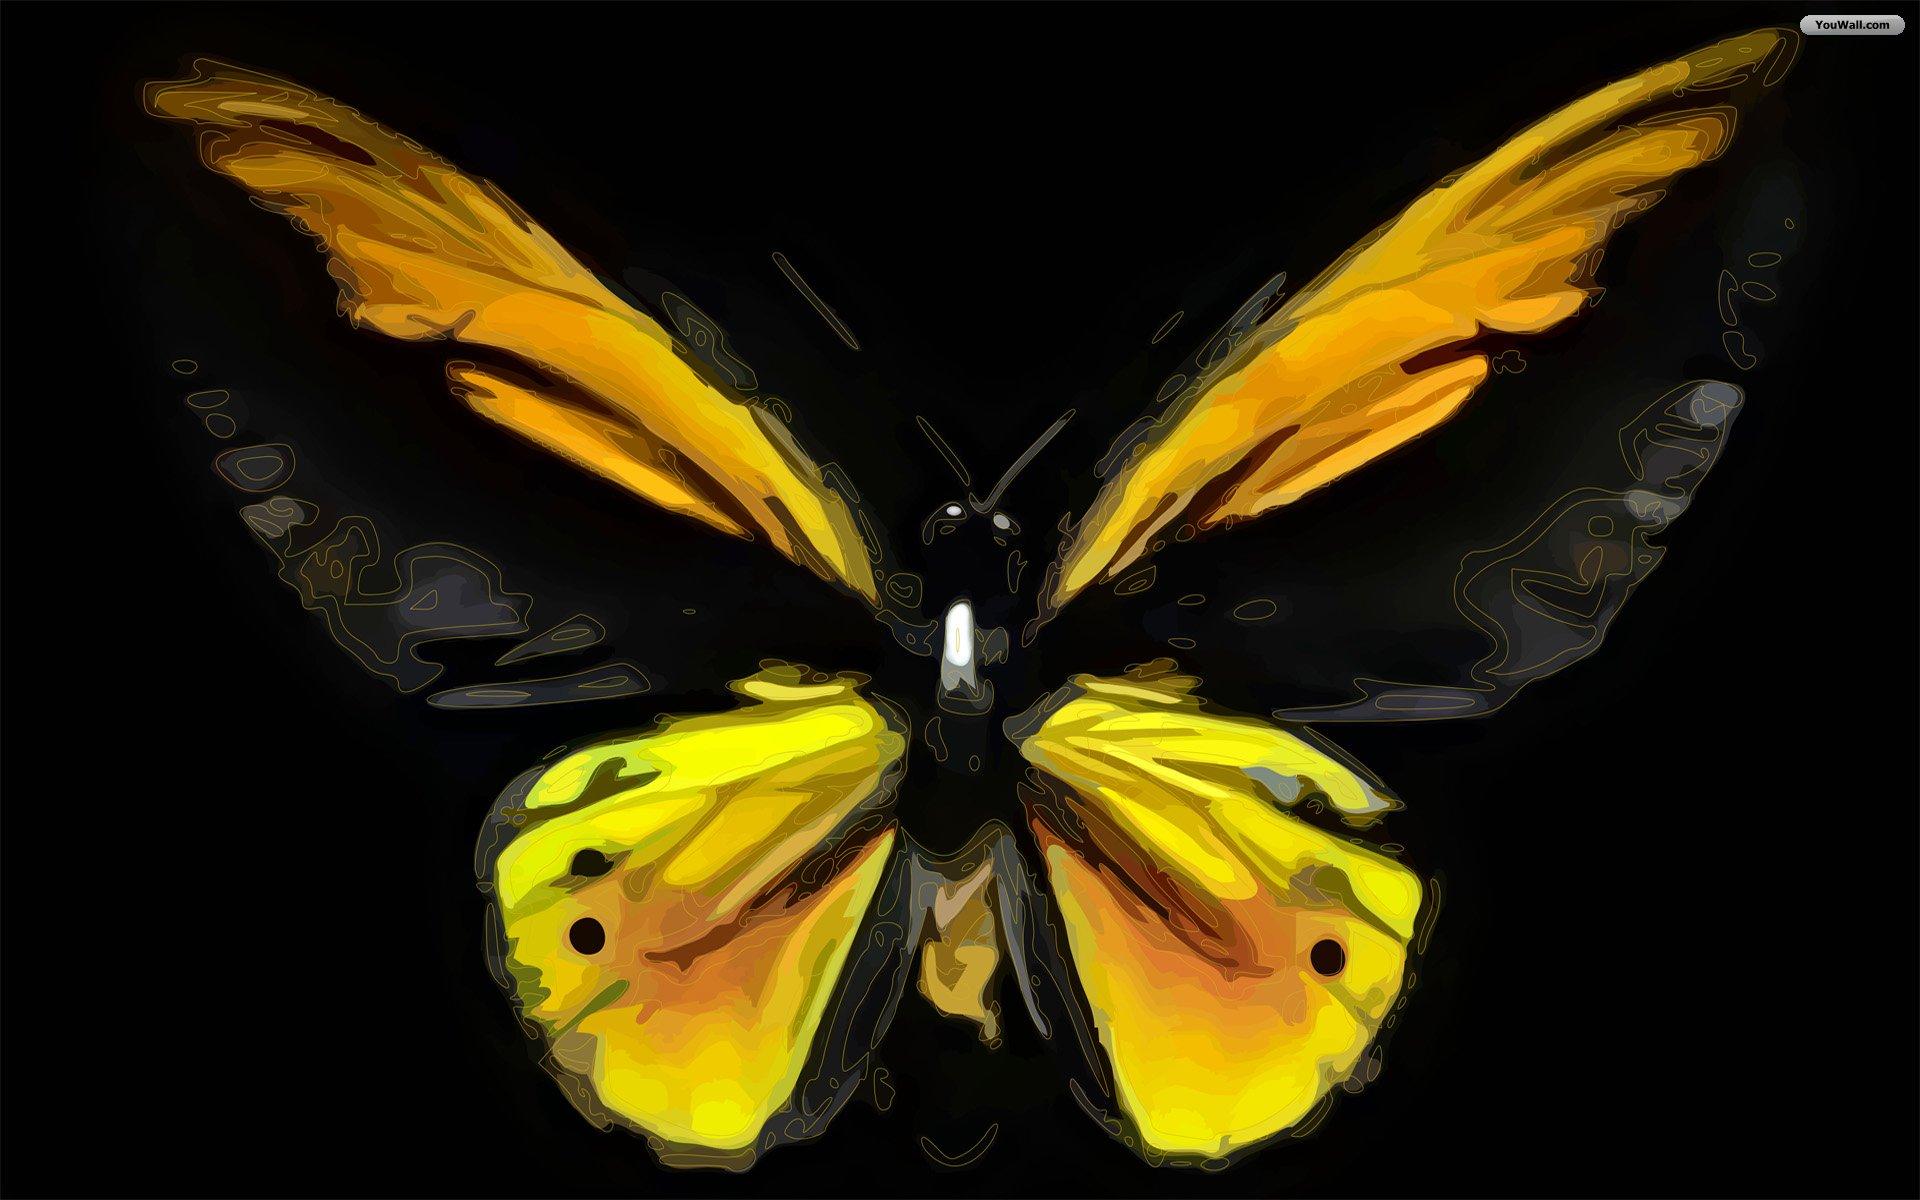 YouWall   Butterfly Wallpaper   wallpaperwallpapersfree wallpaper 1920x1200